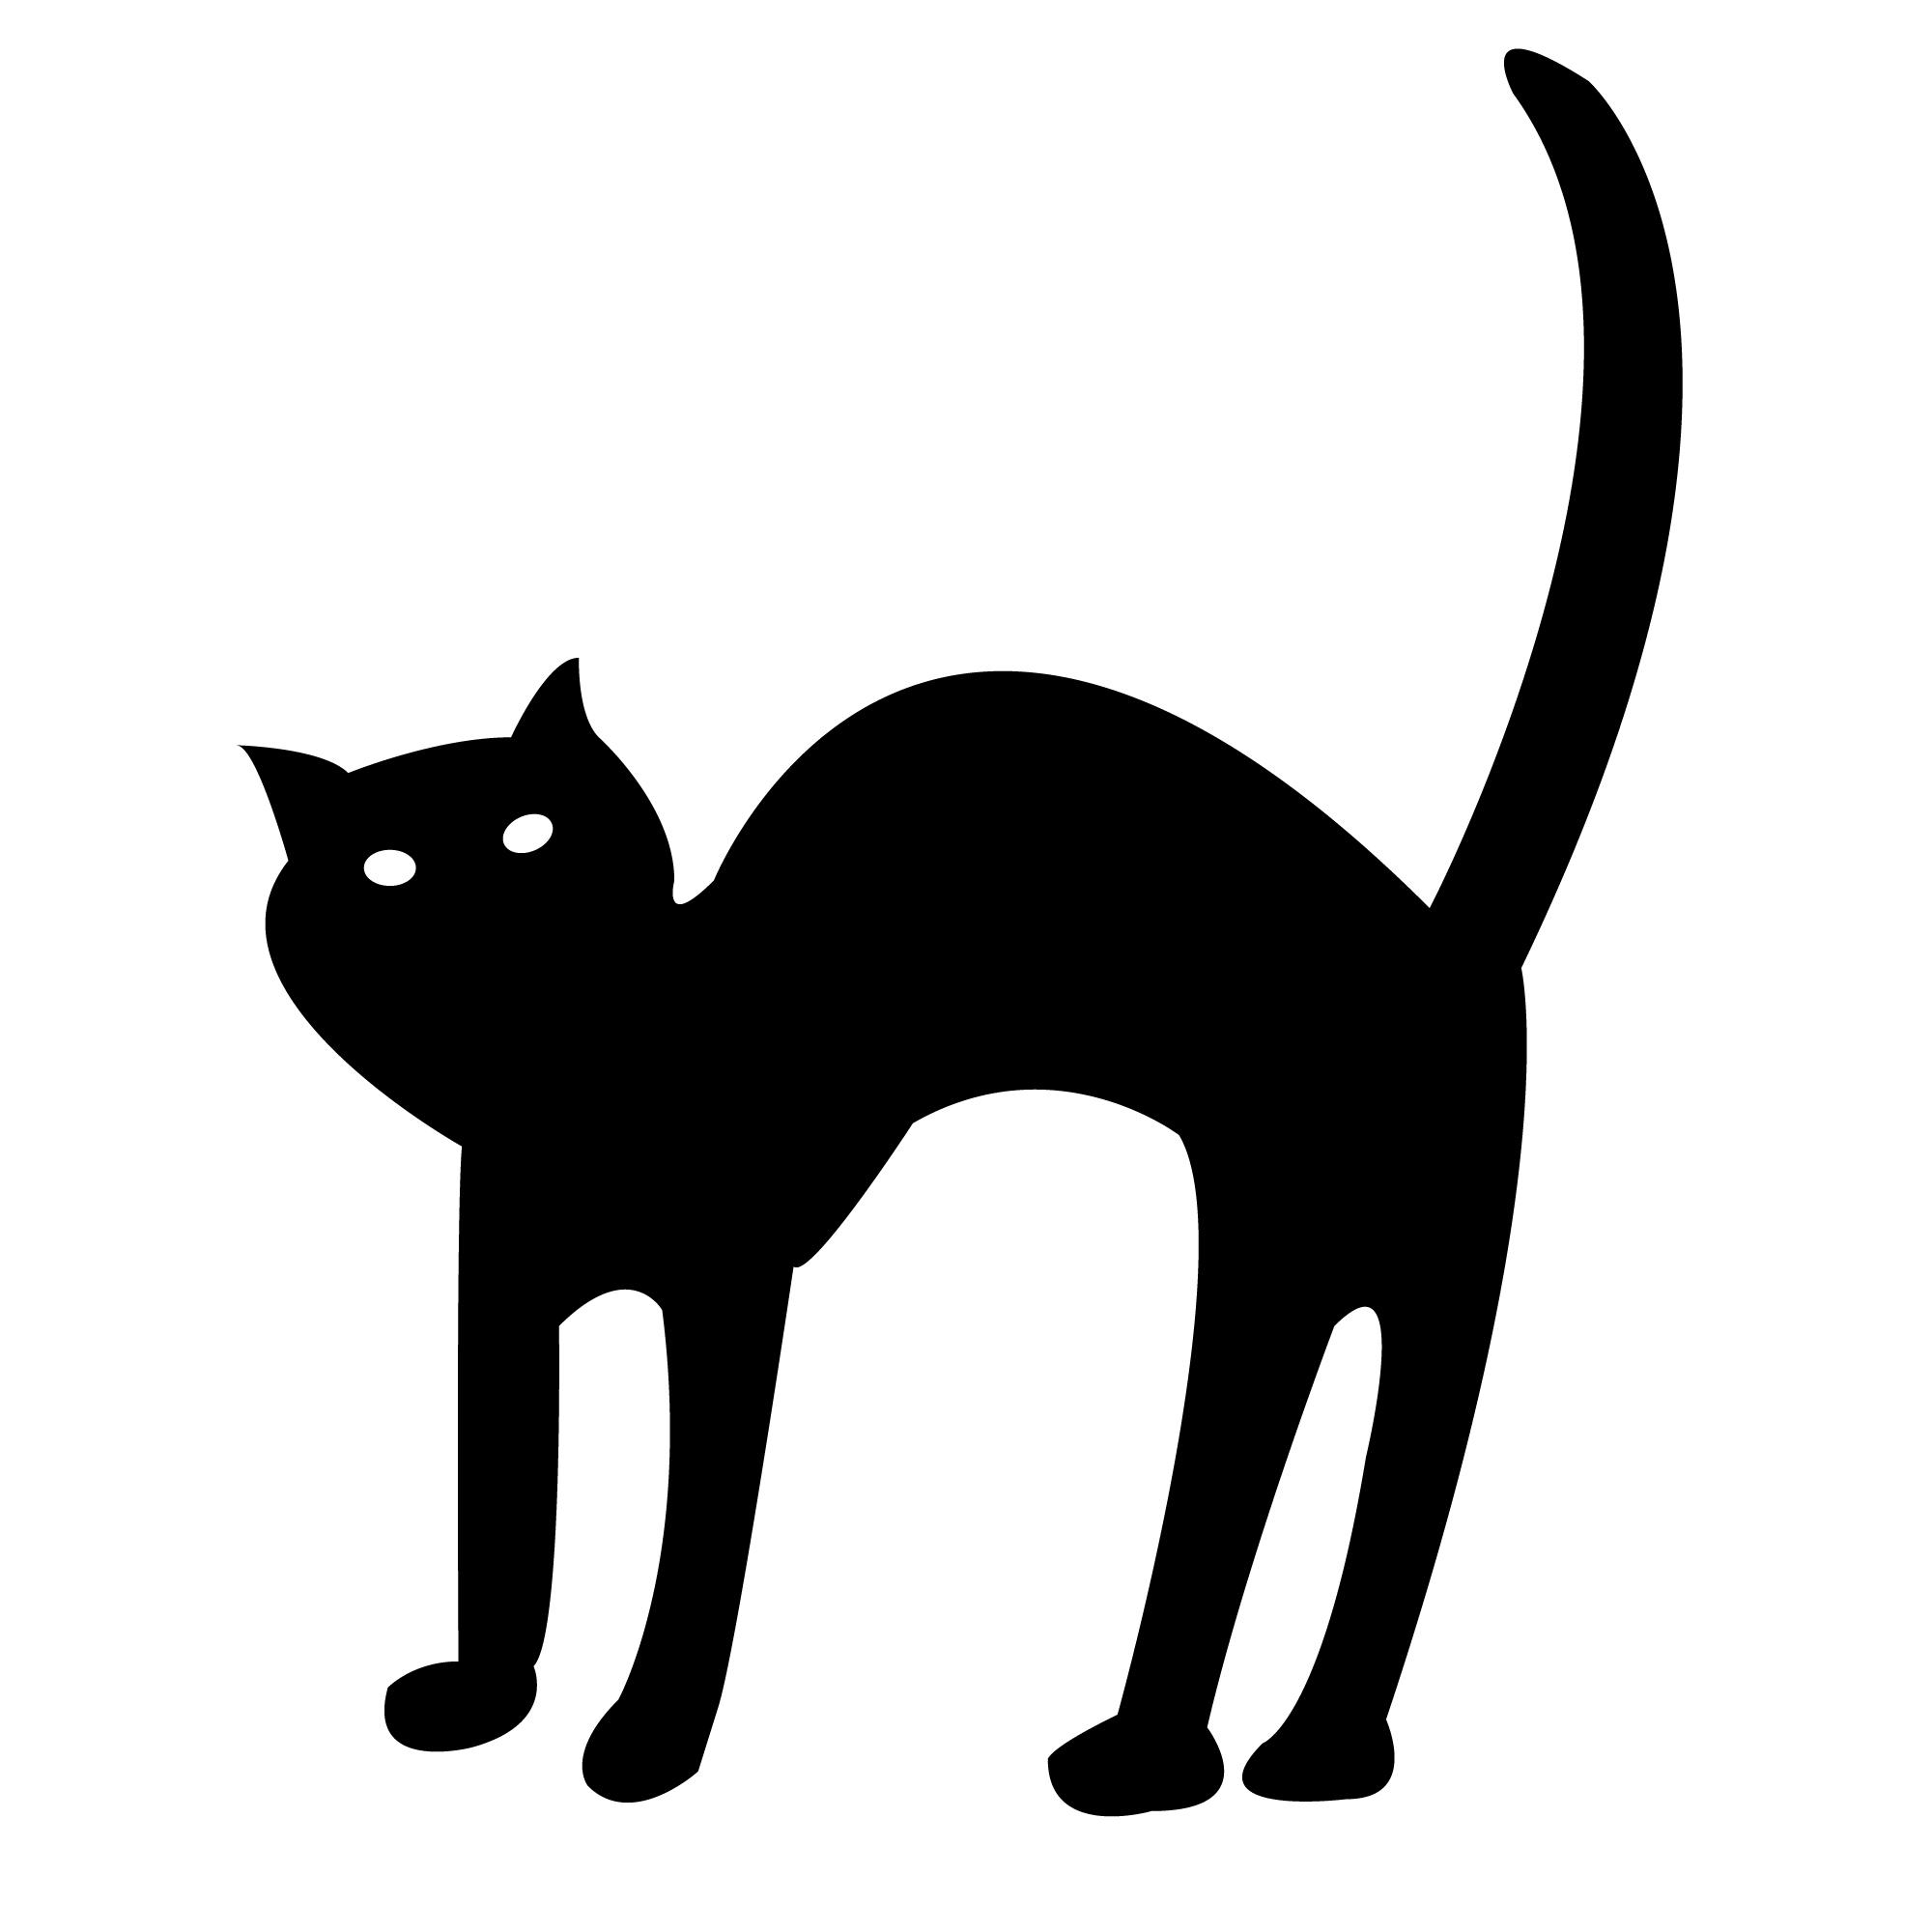 Black Cat clipart #7, Download drawings